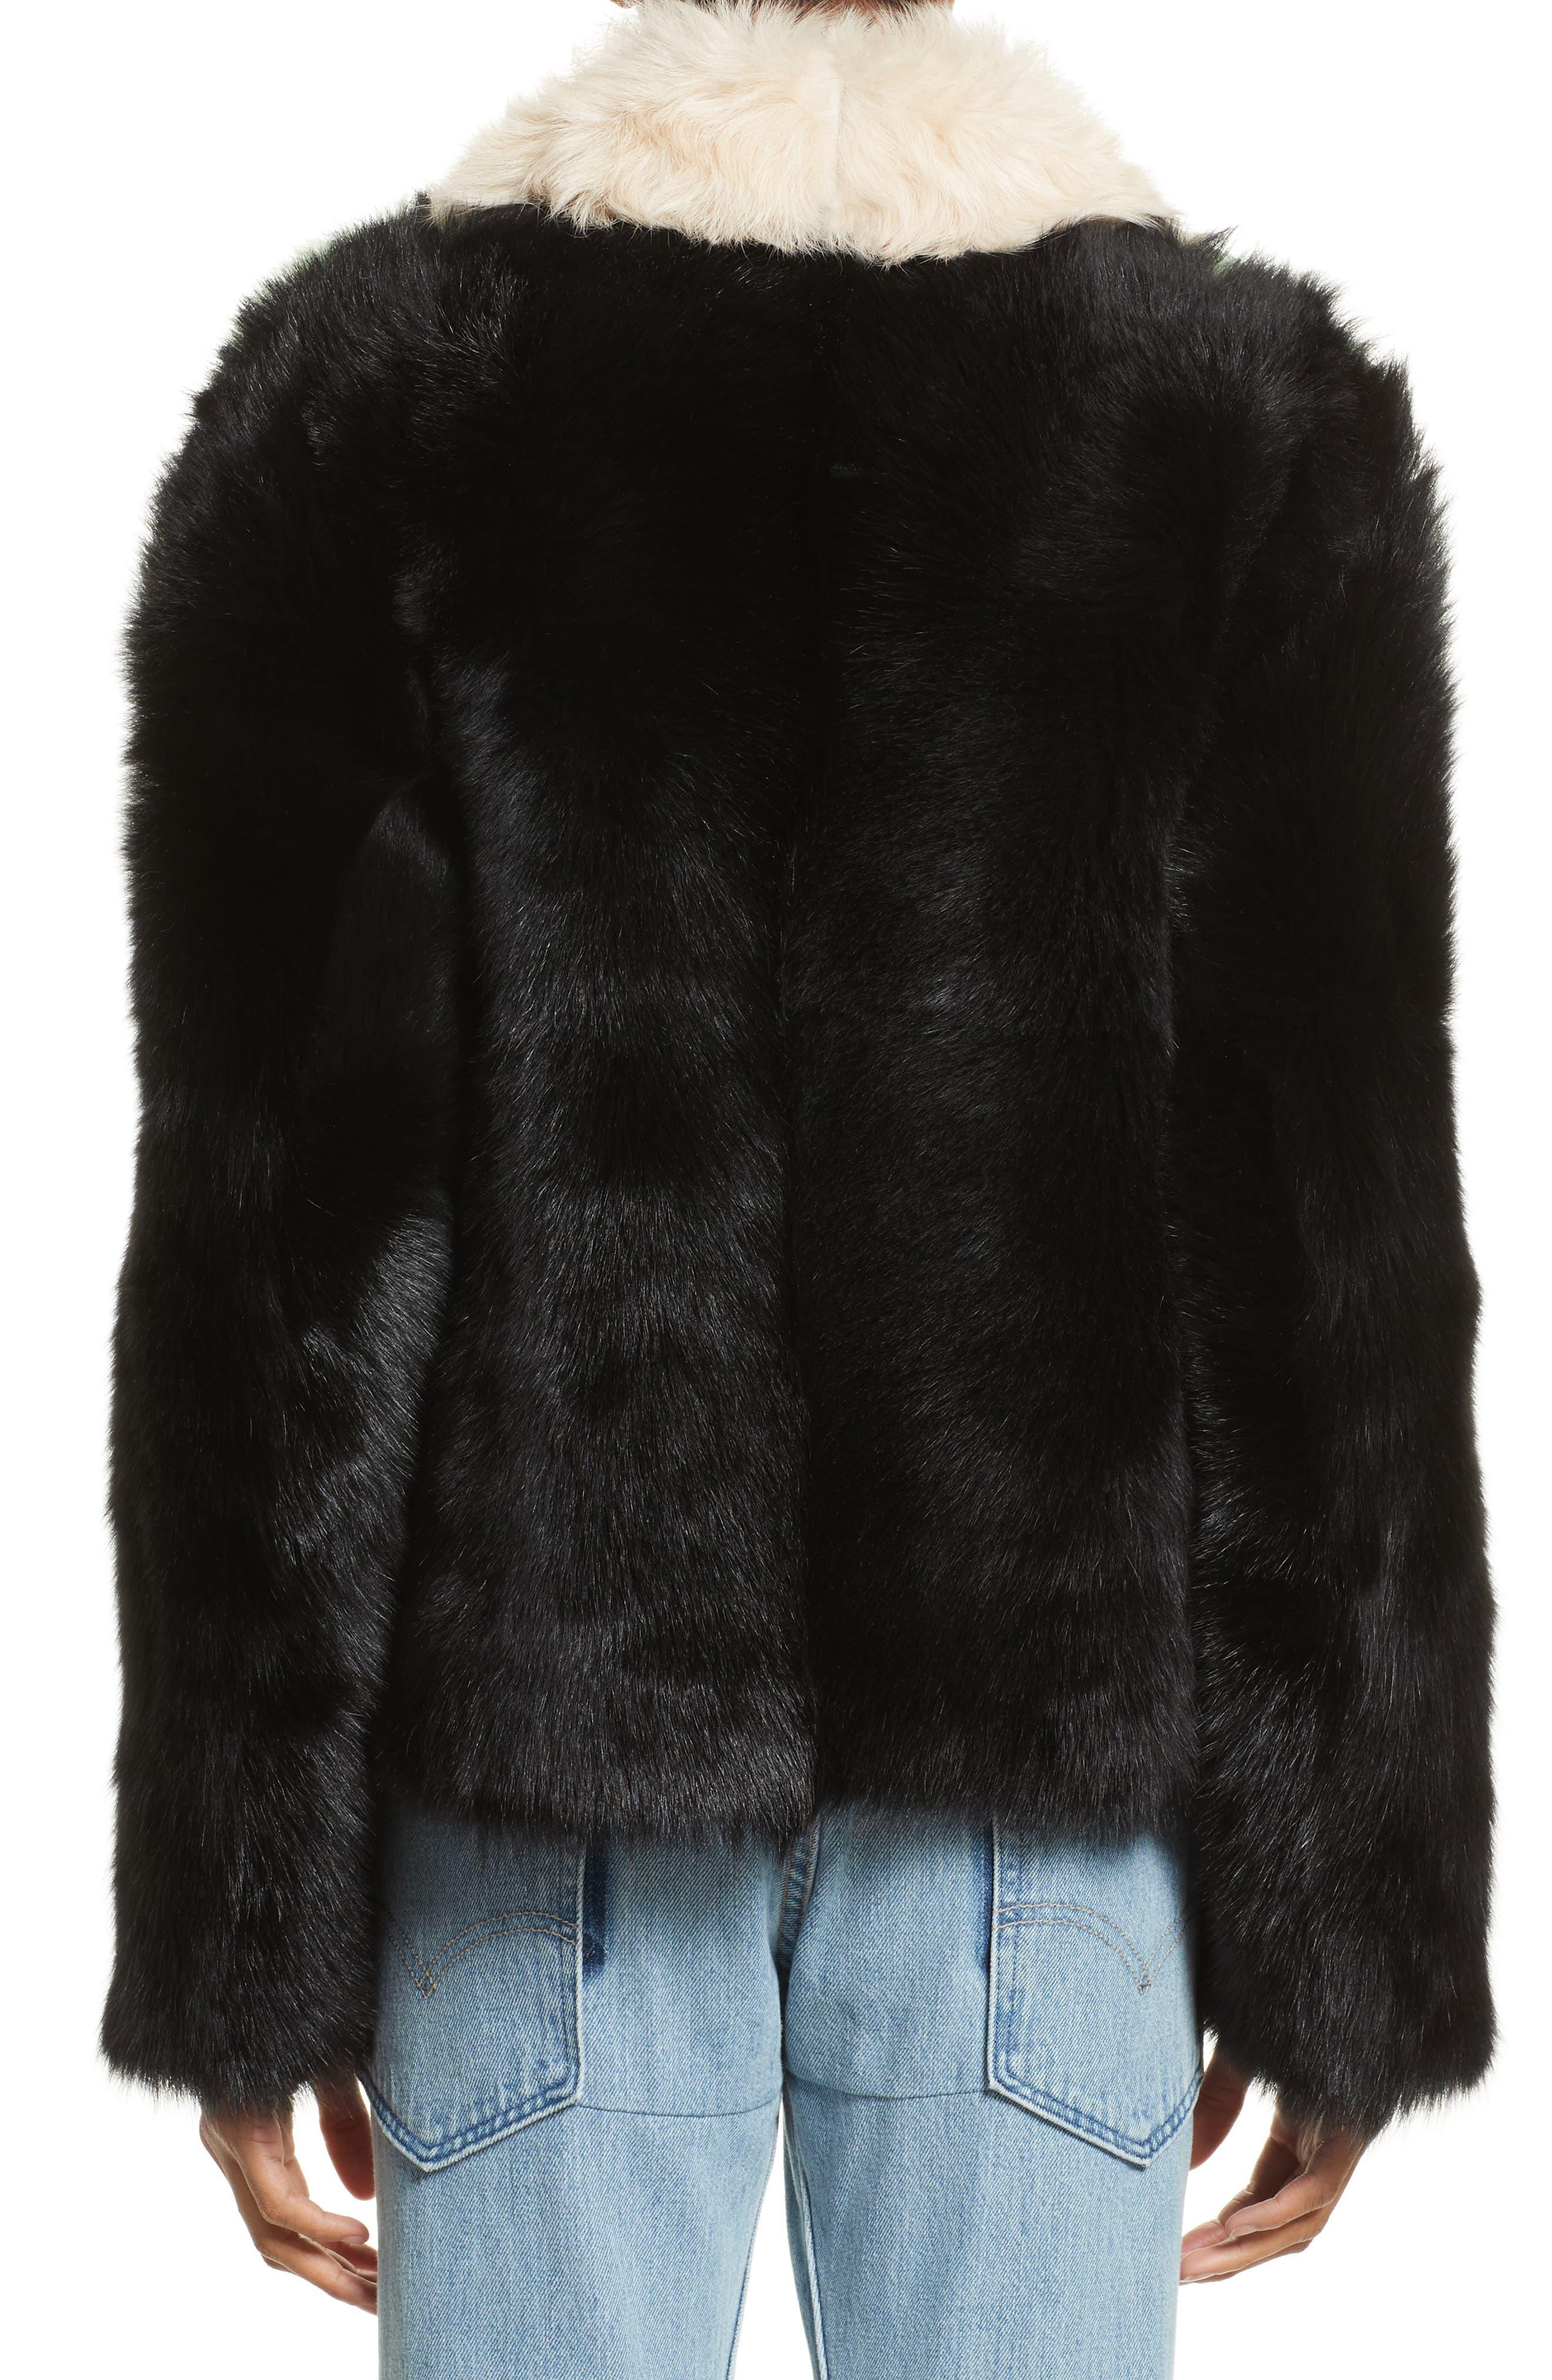 Cashew Genuine Shearling Coat,                             Alternate thumbnail 3, color,